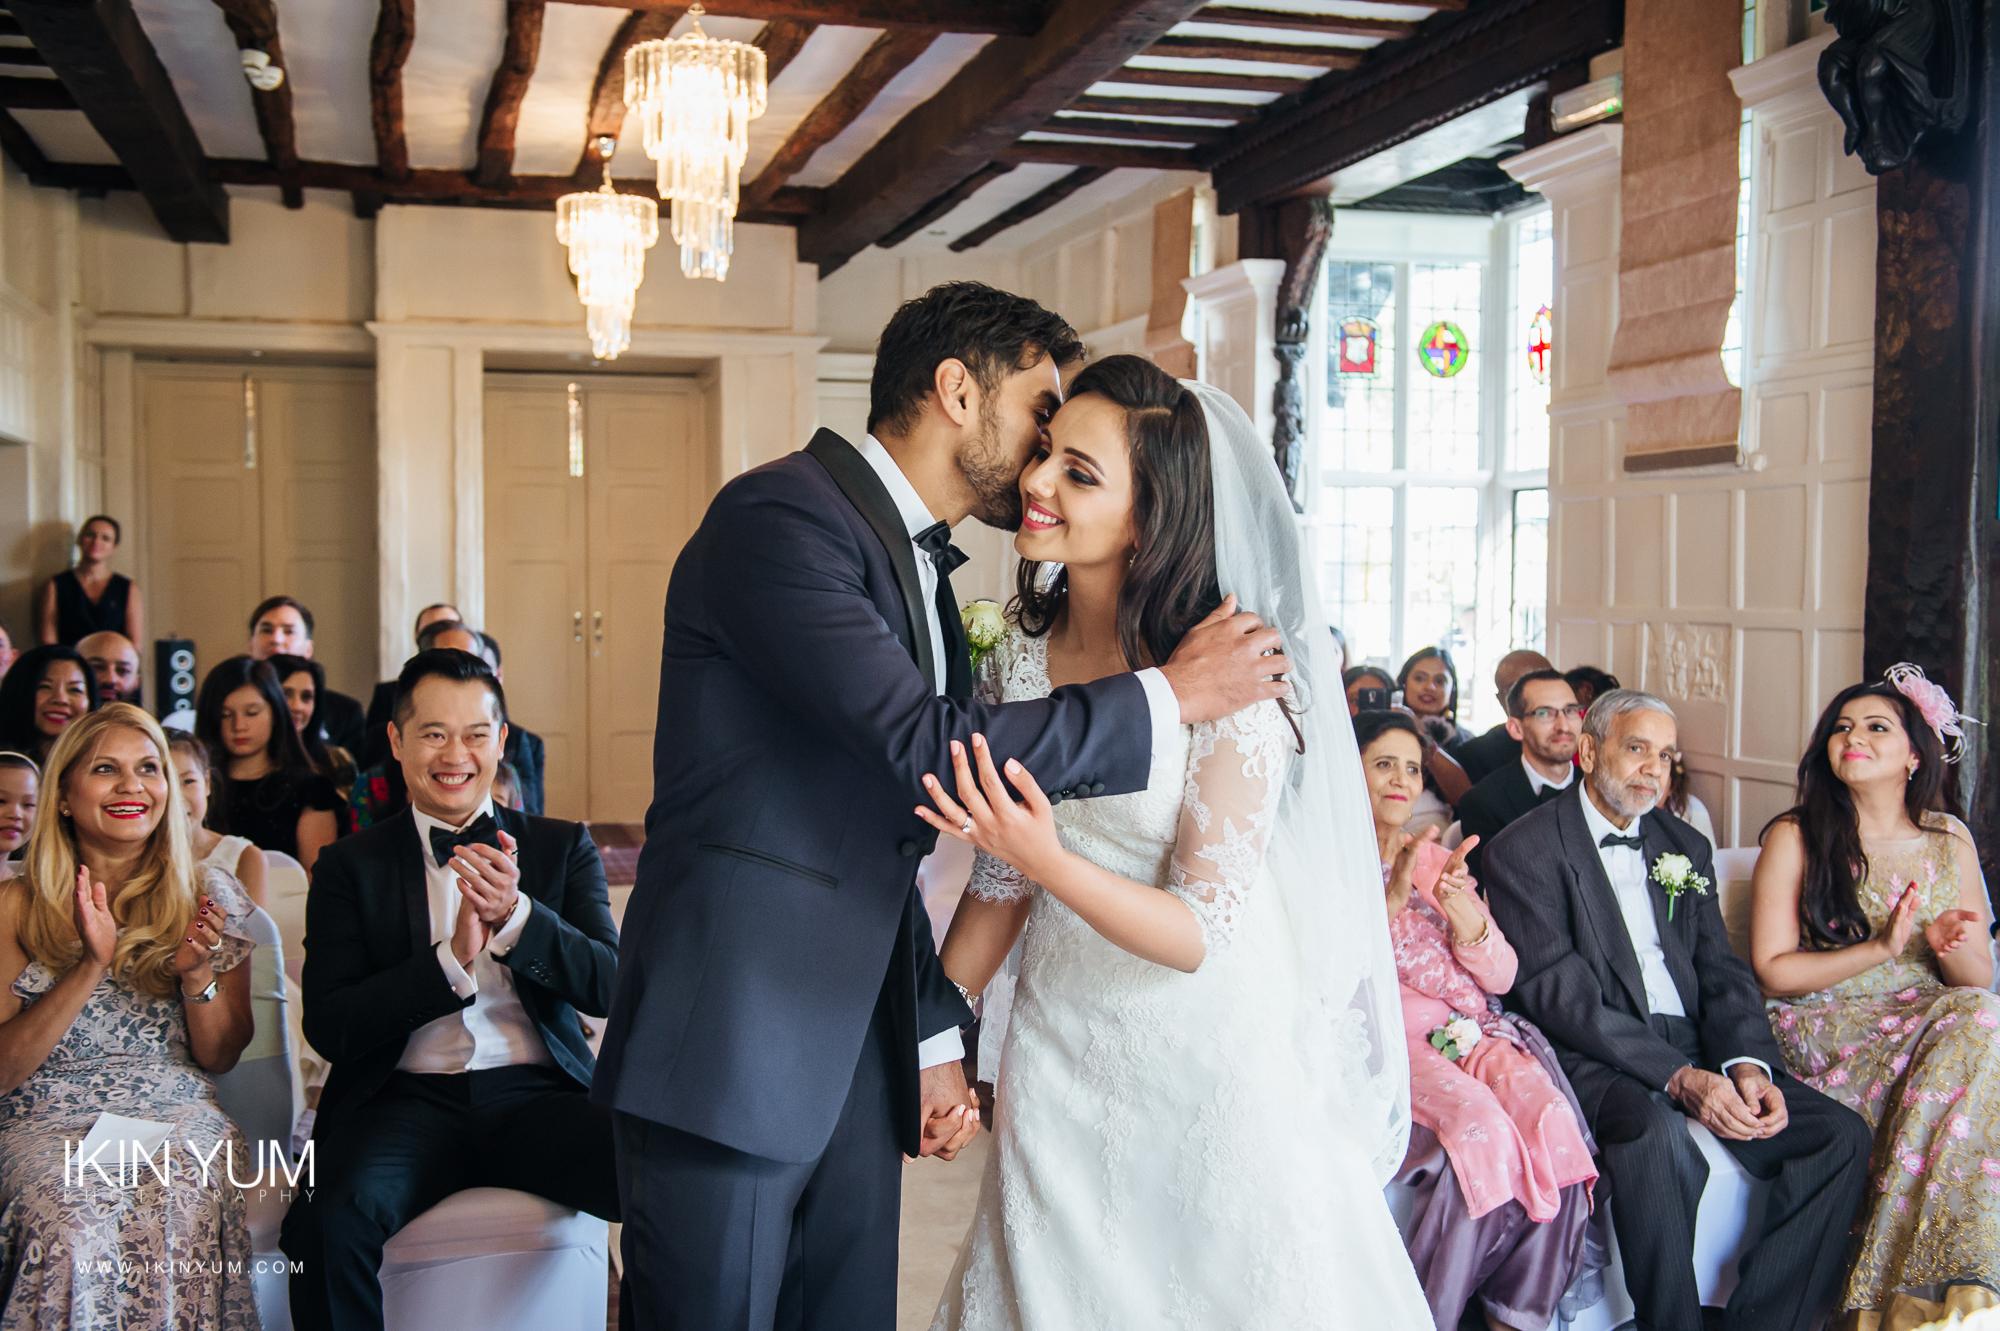 Laura Ashley Manor Wedding - Ikin Yum Photography-062.jpg